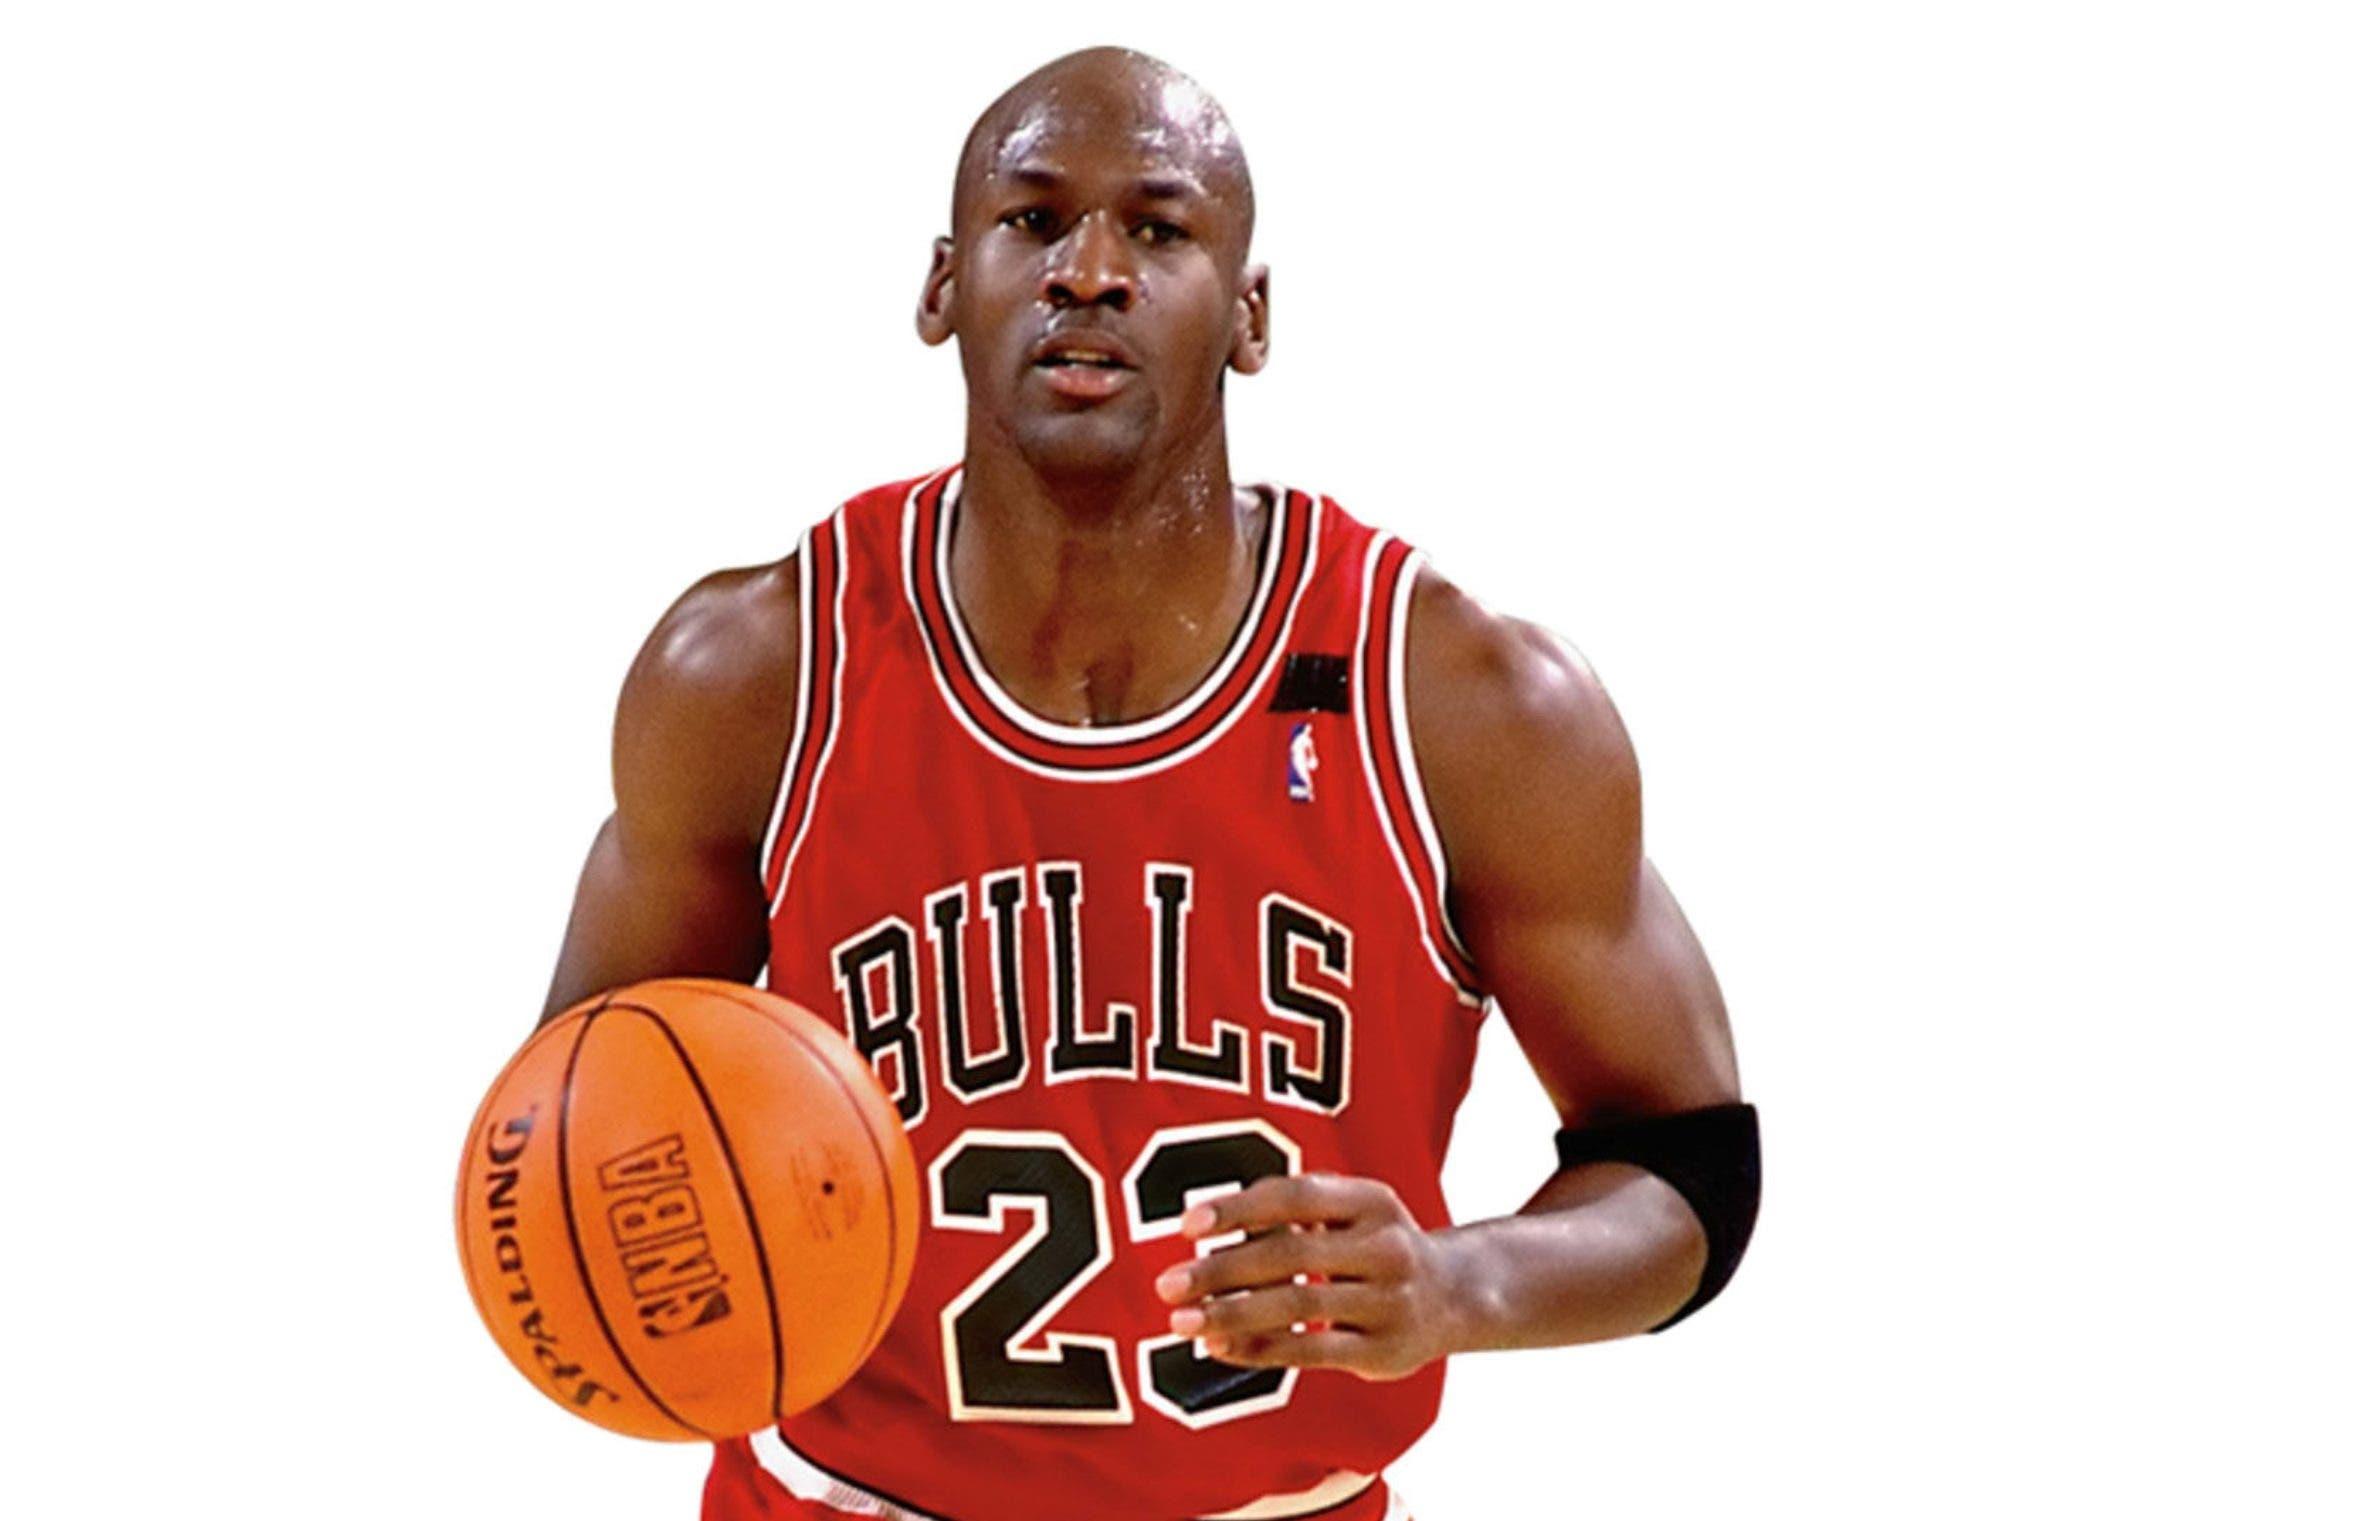 Tarjeta de Jordan tiene venta récord